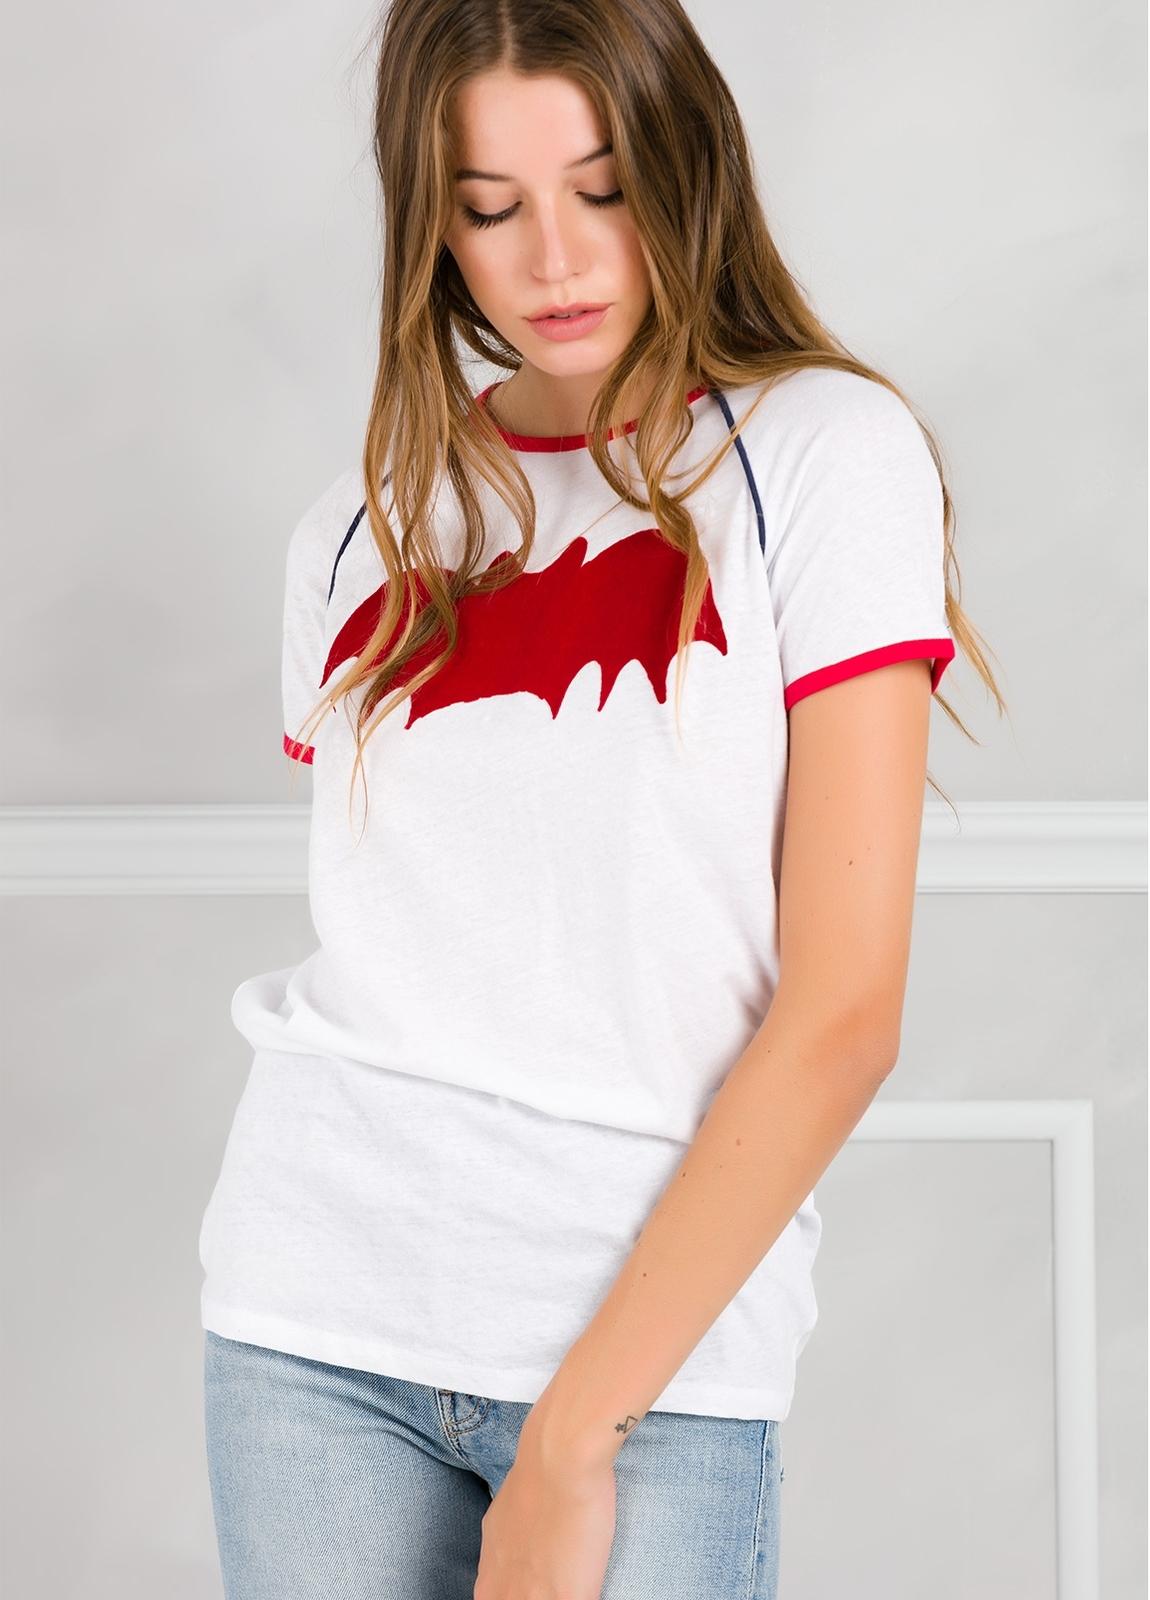 Camiseta manga corta color blanco con motivo gráfico.